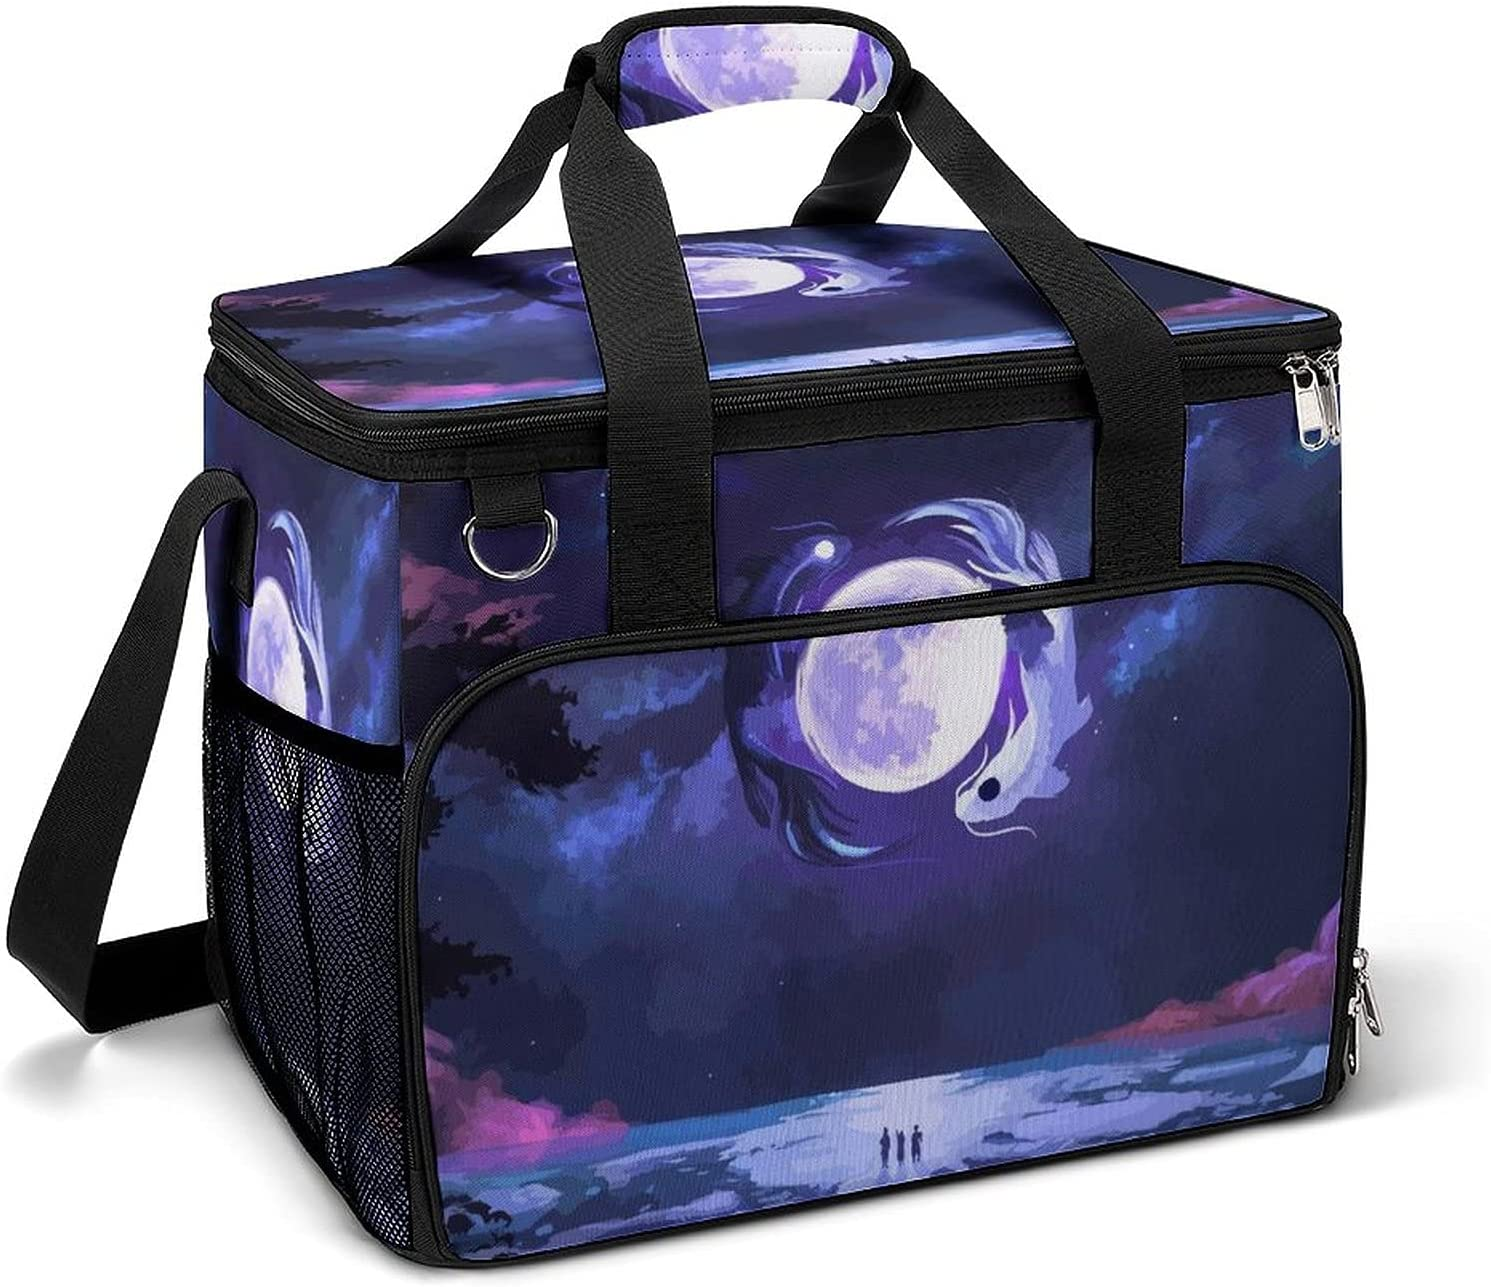 shipfree Cooler Ice Bag Anime Landscape Pattern Custom Portable Large Challenge the lowest price of Japan Cap